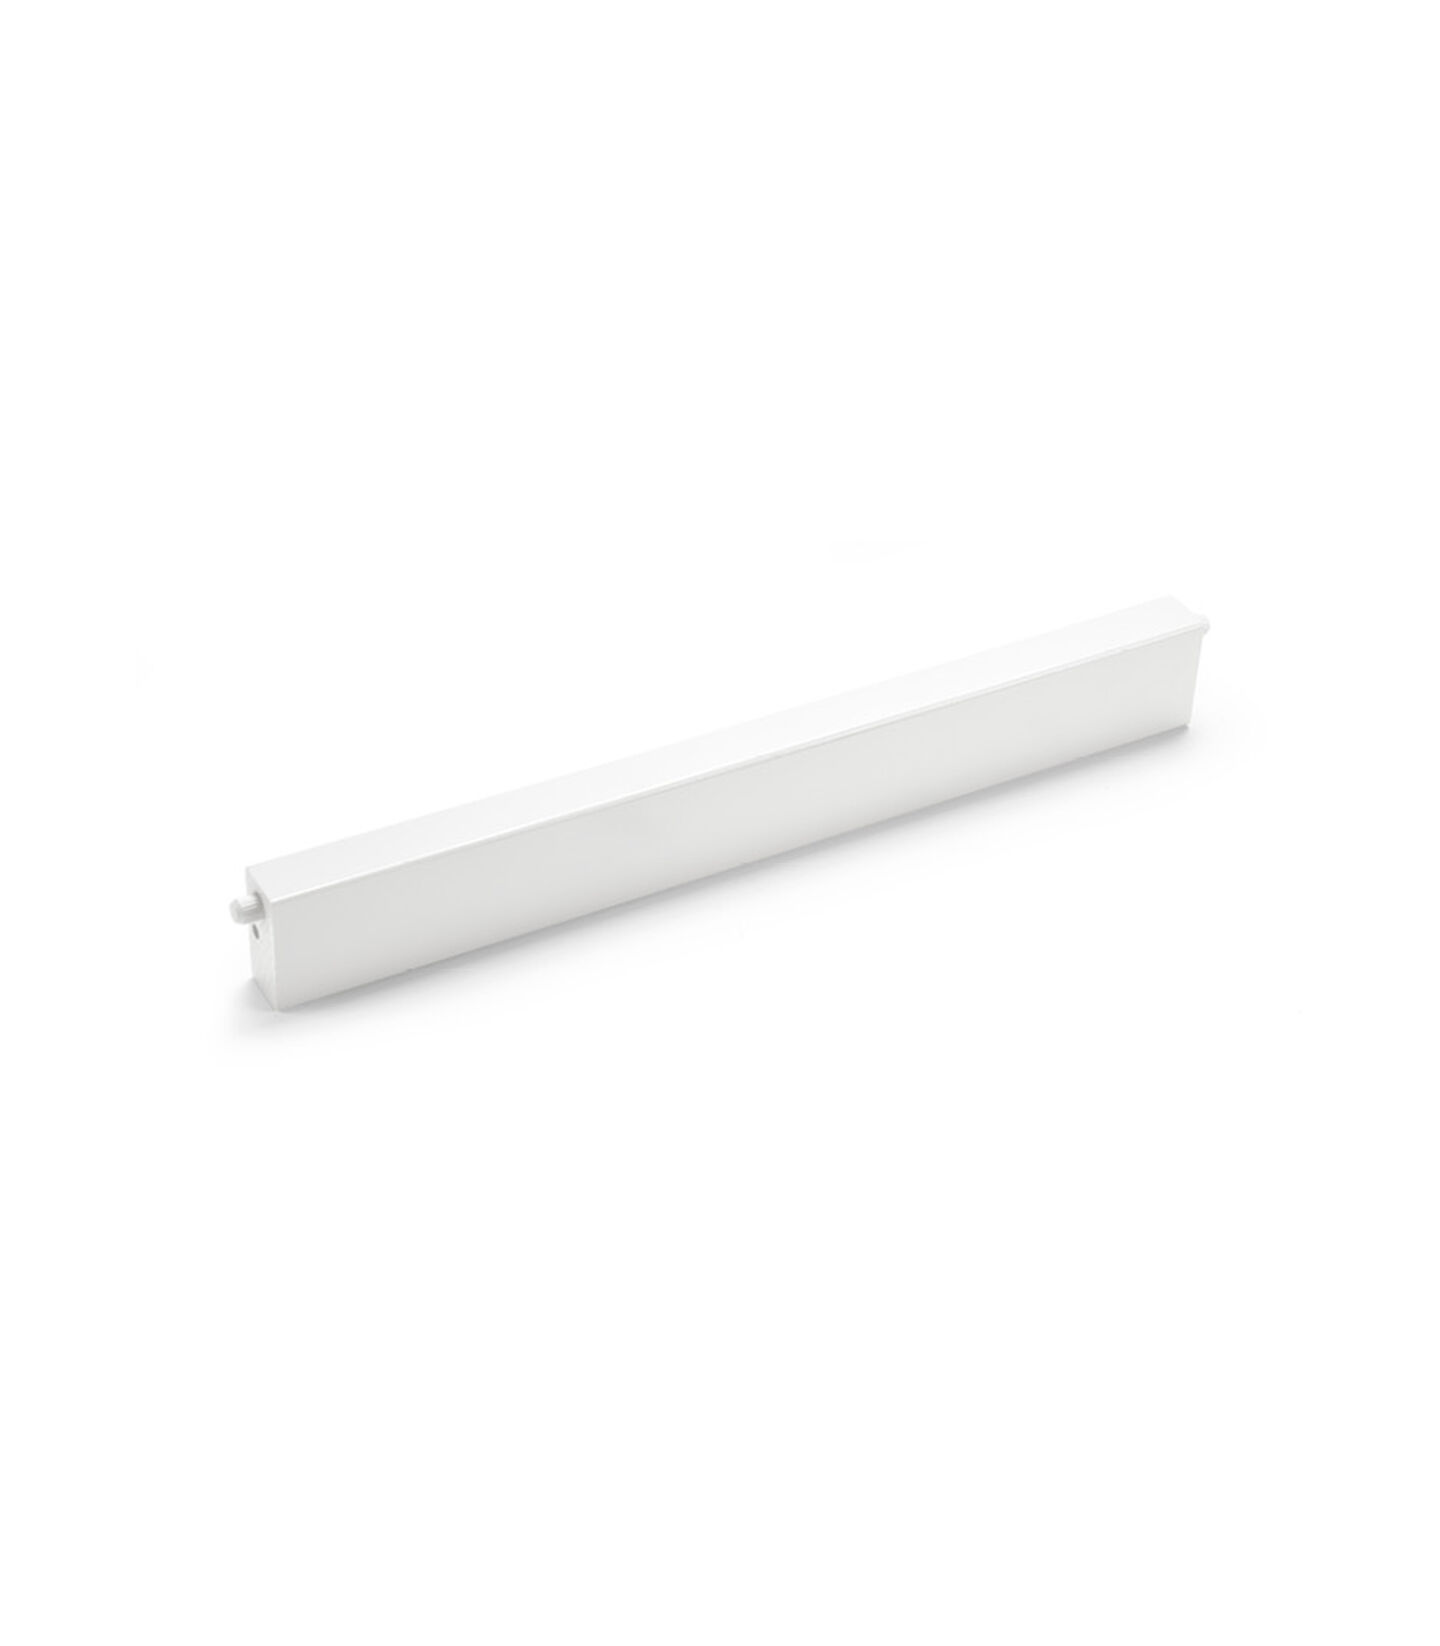 Tripp Trapp® Support de Plancher Blanc, Blanc, mainview view 1